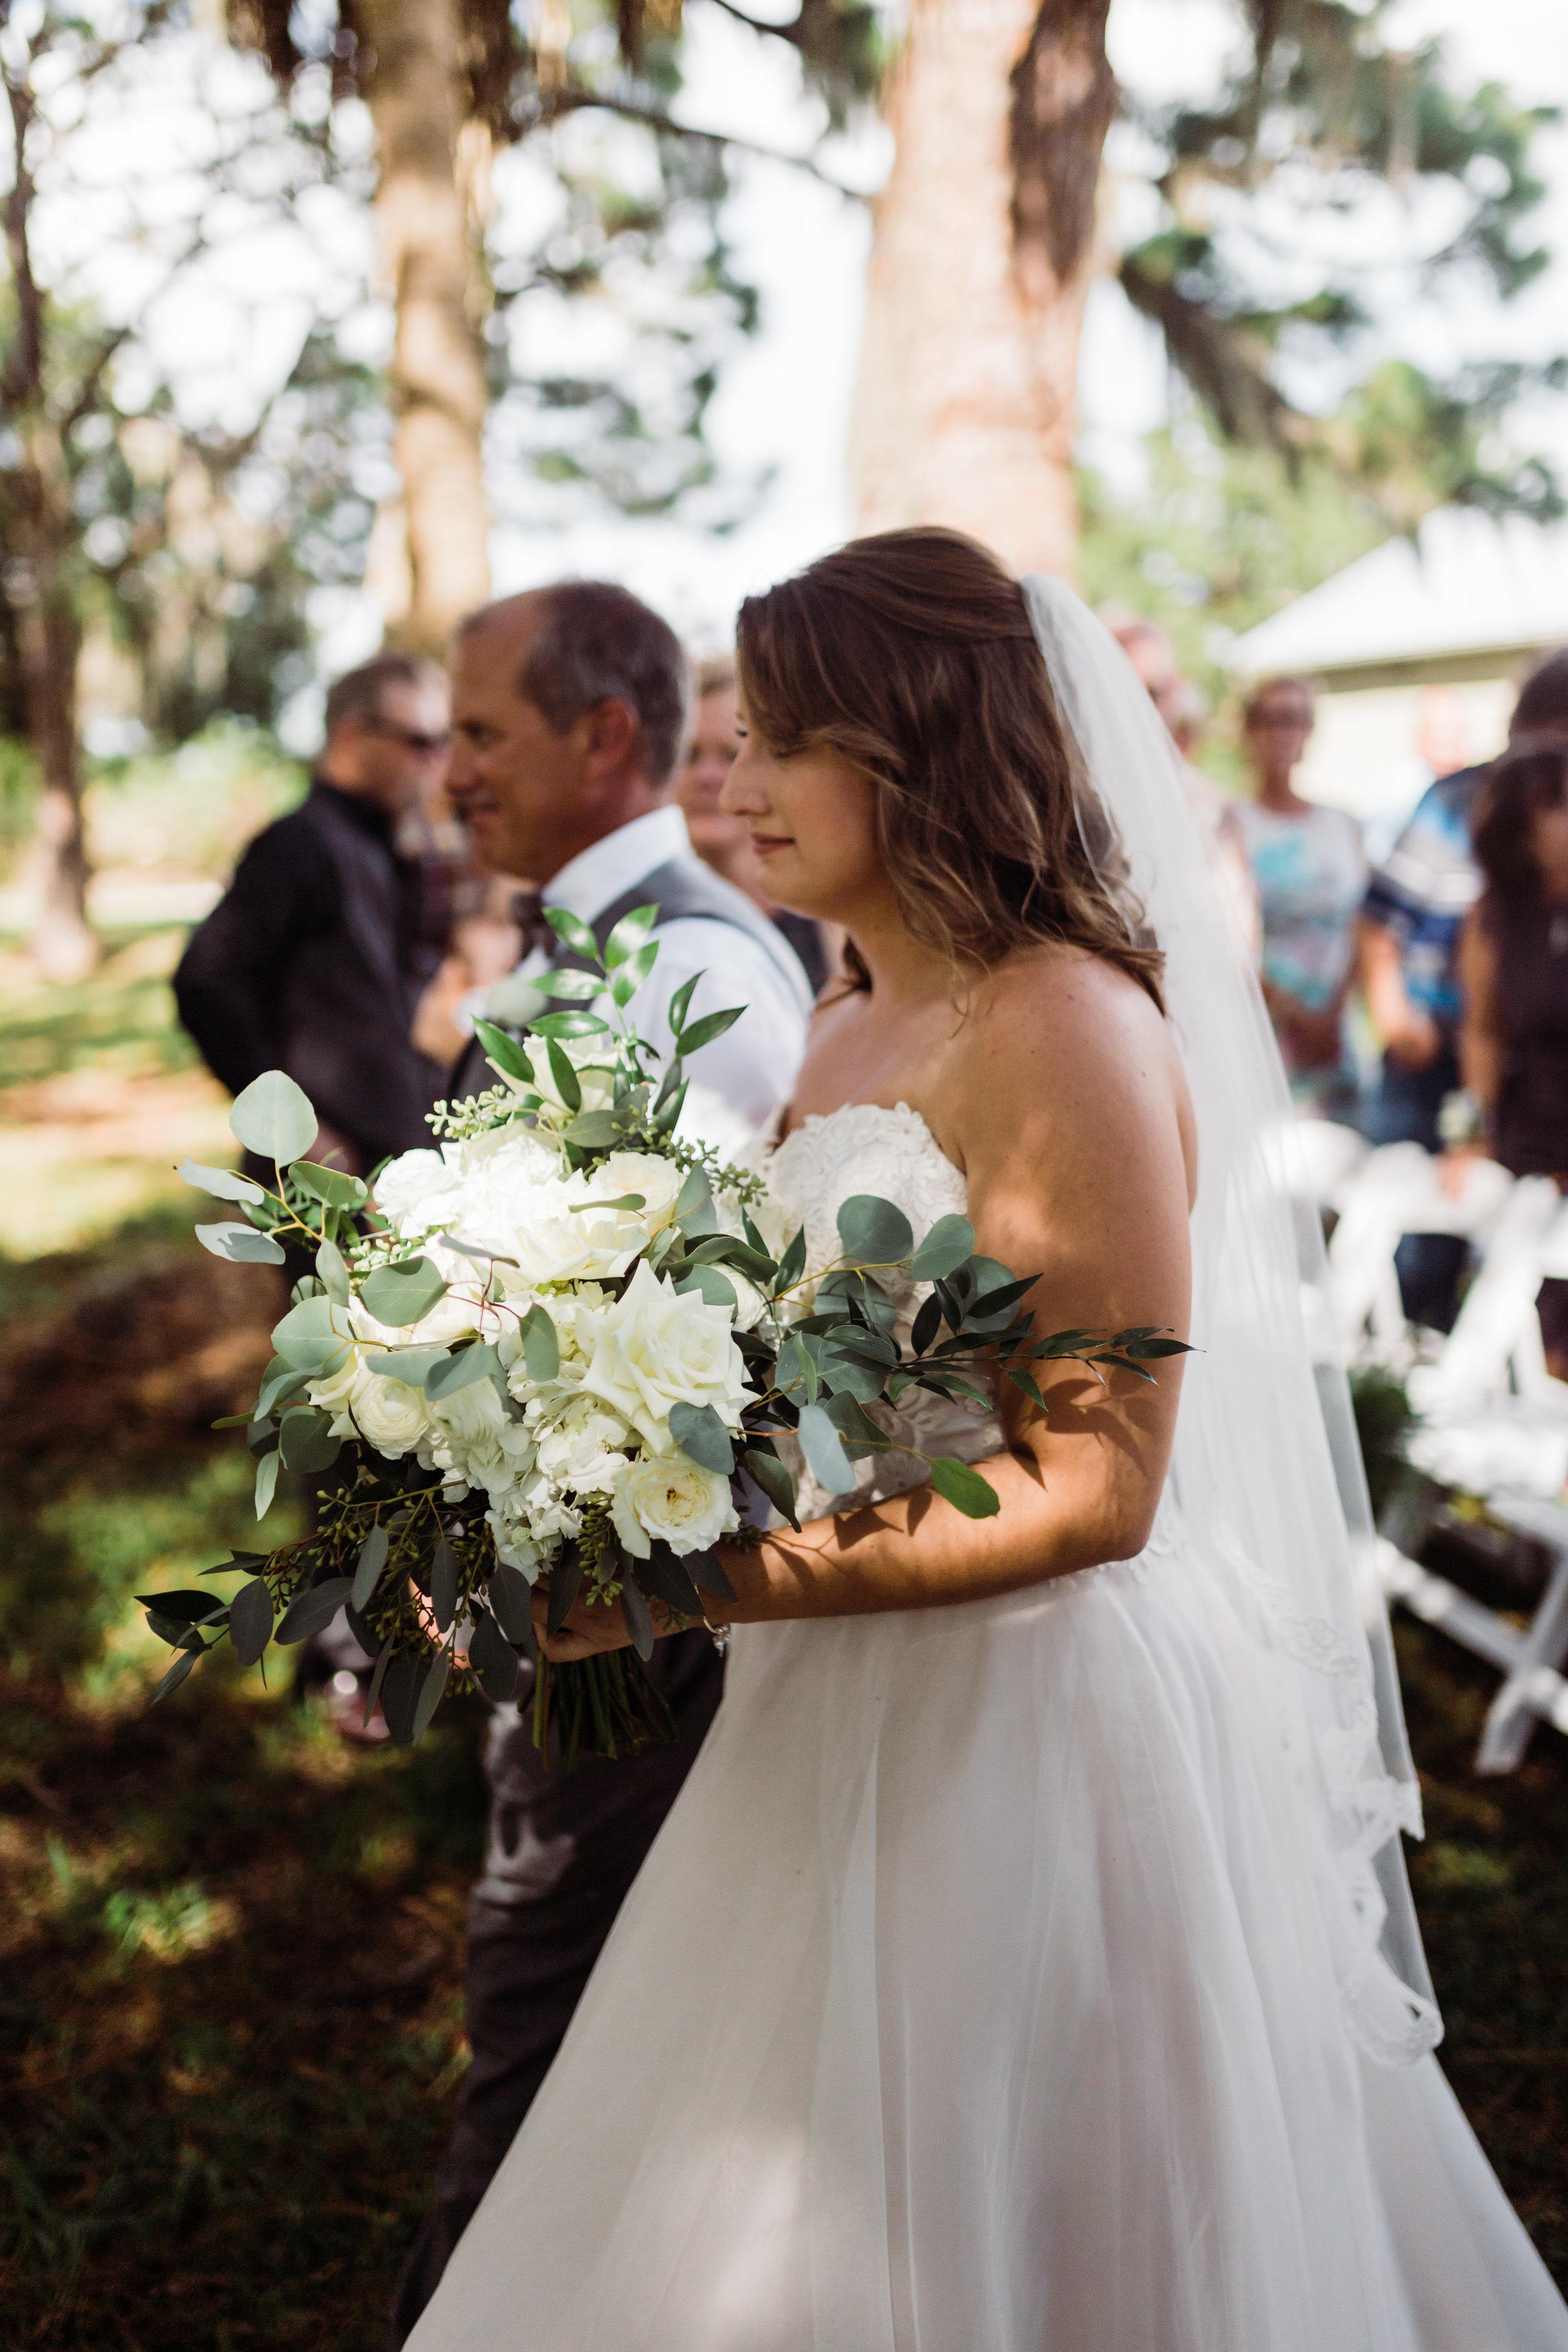 2017.10.14 Samantha and Matthew Crabtree Sarasota Wedding (137 of 708).jpg